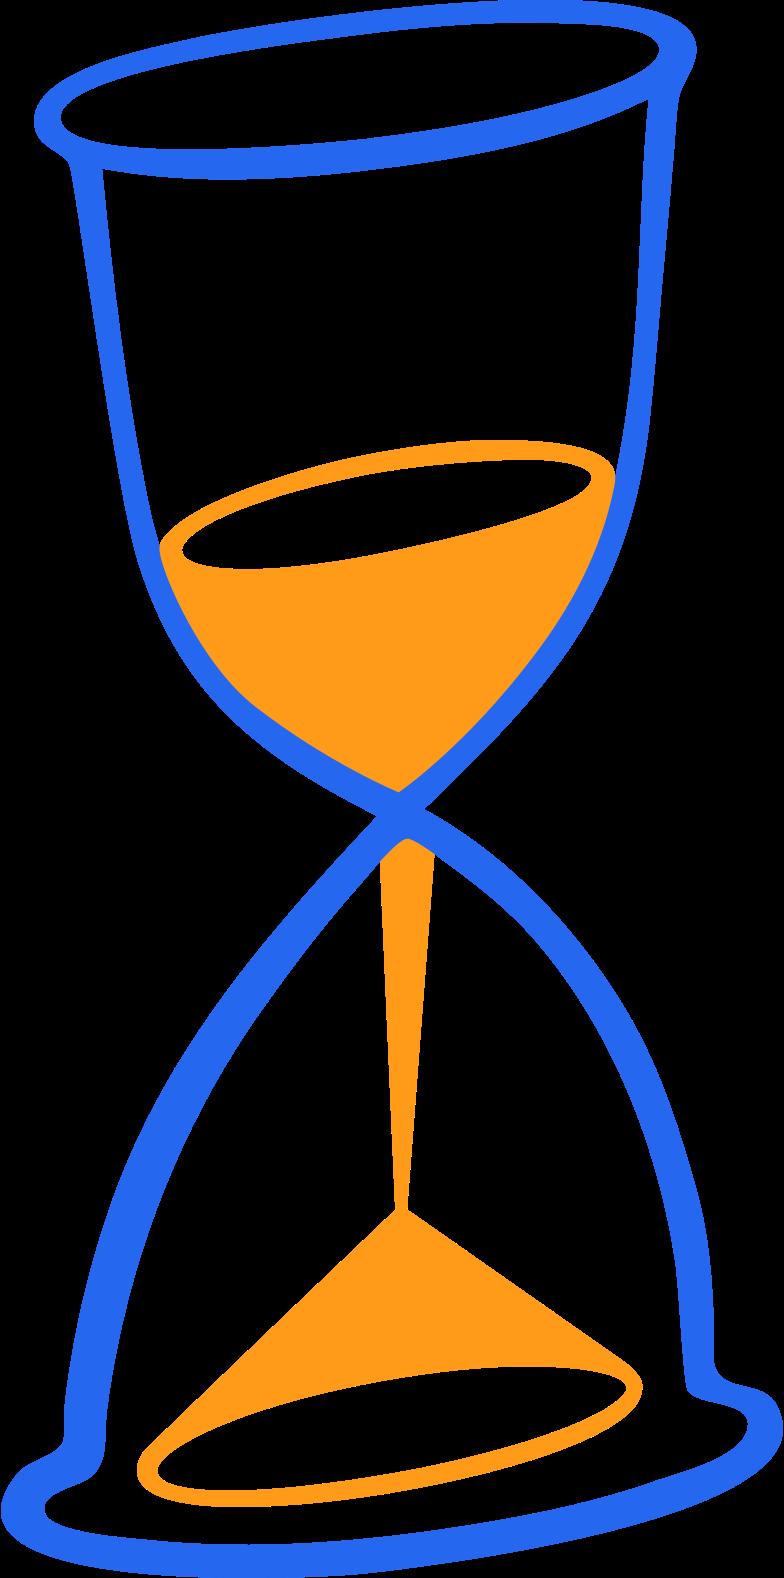 hourglass PNG, SVG 형식의 클립 아트 일러스트레이션